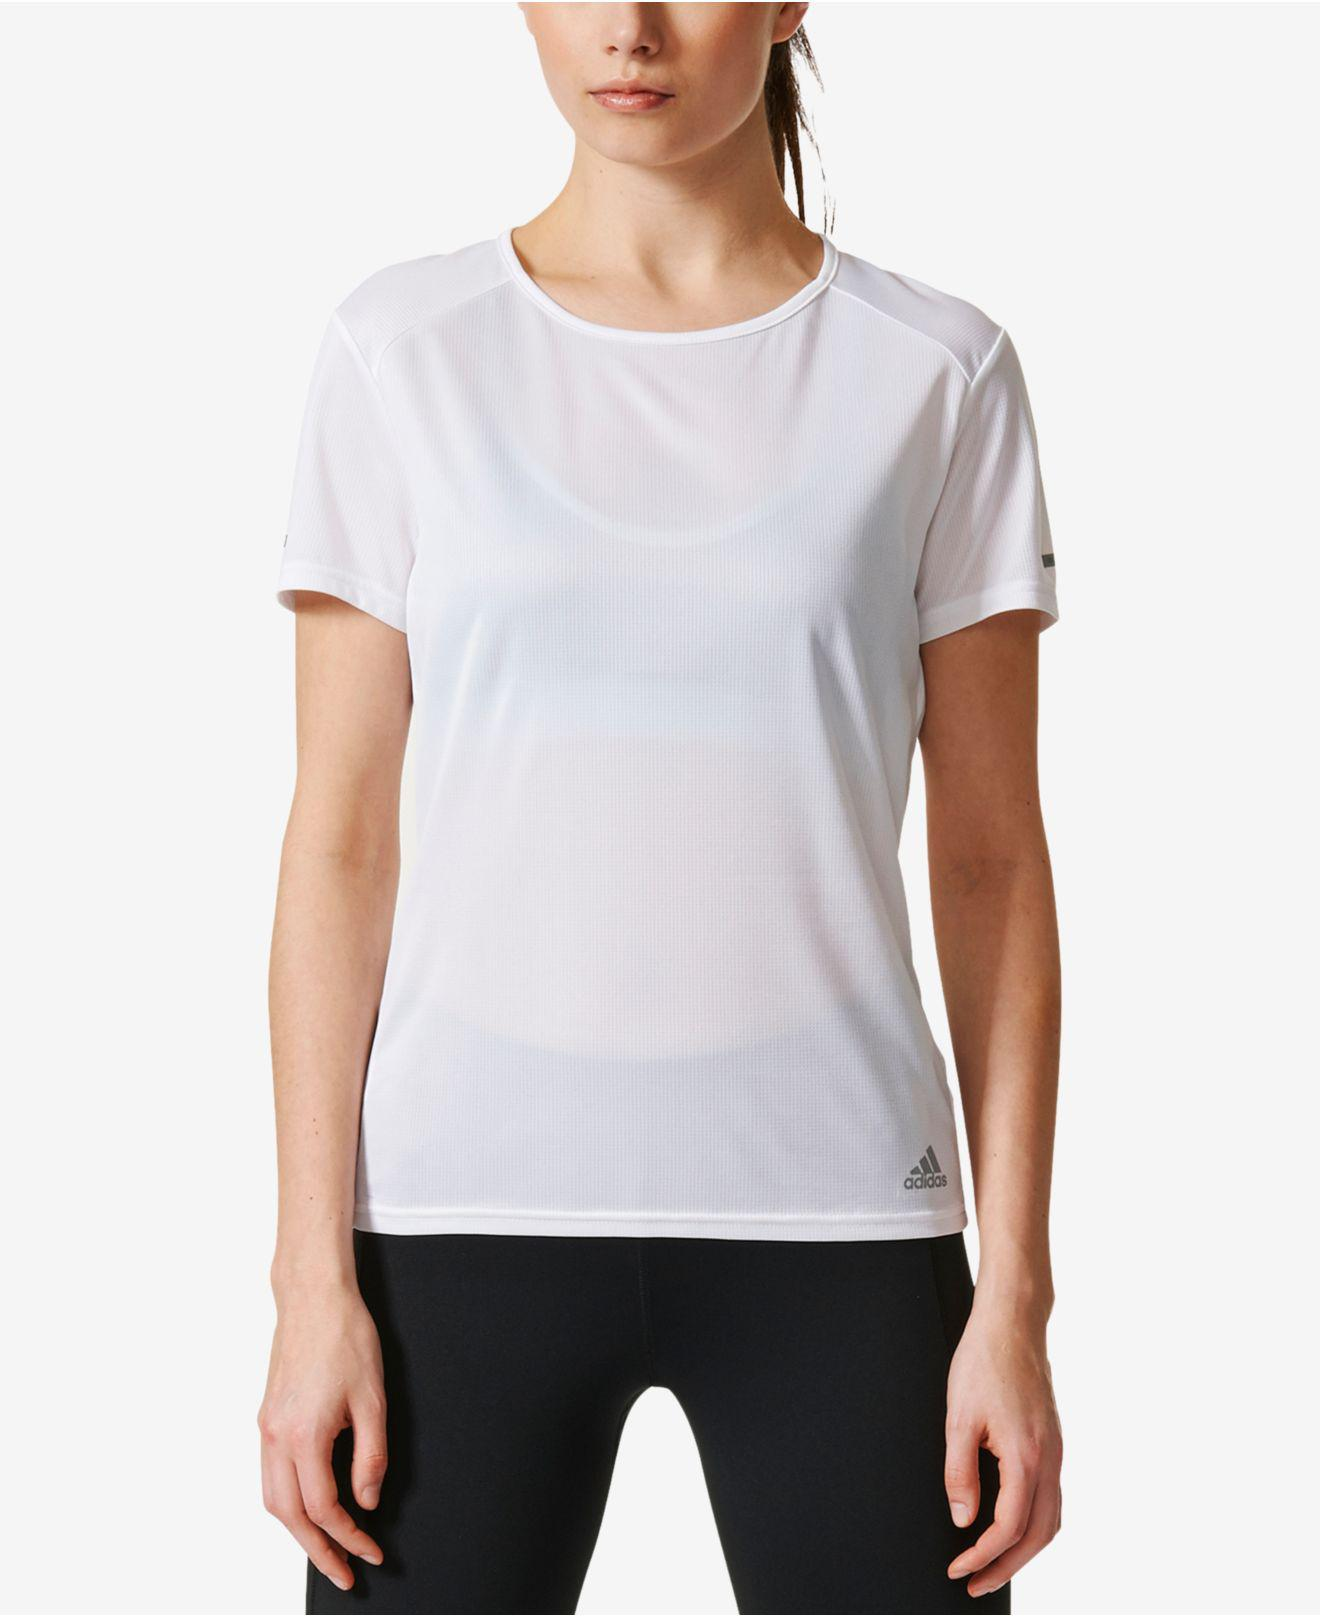 8439cb1e974347 Adidas - White Climalite® Running T-shirt - Lyst. View fullscreen